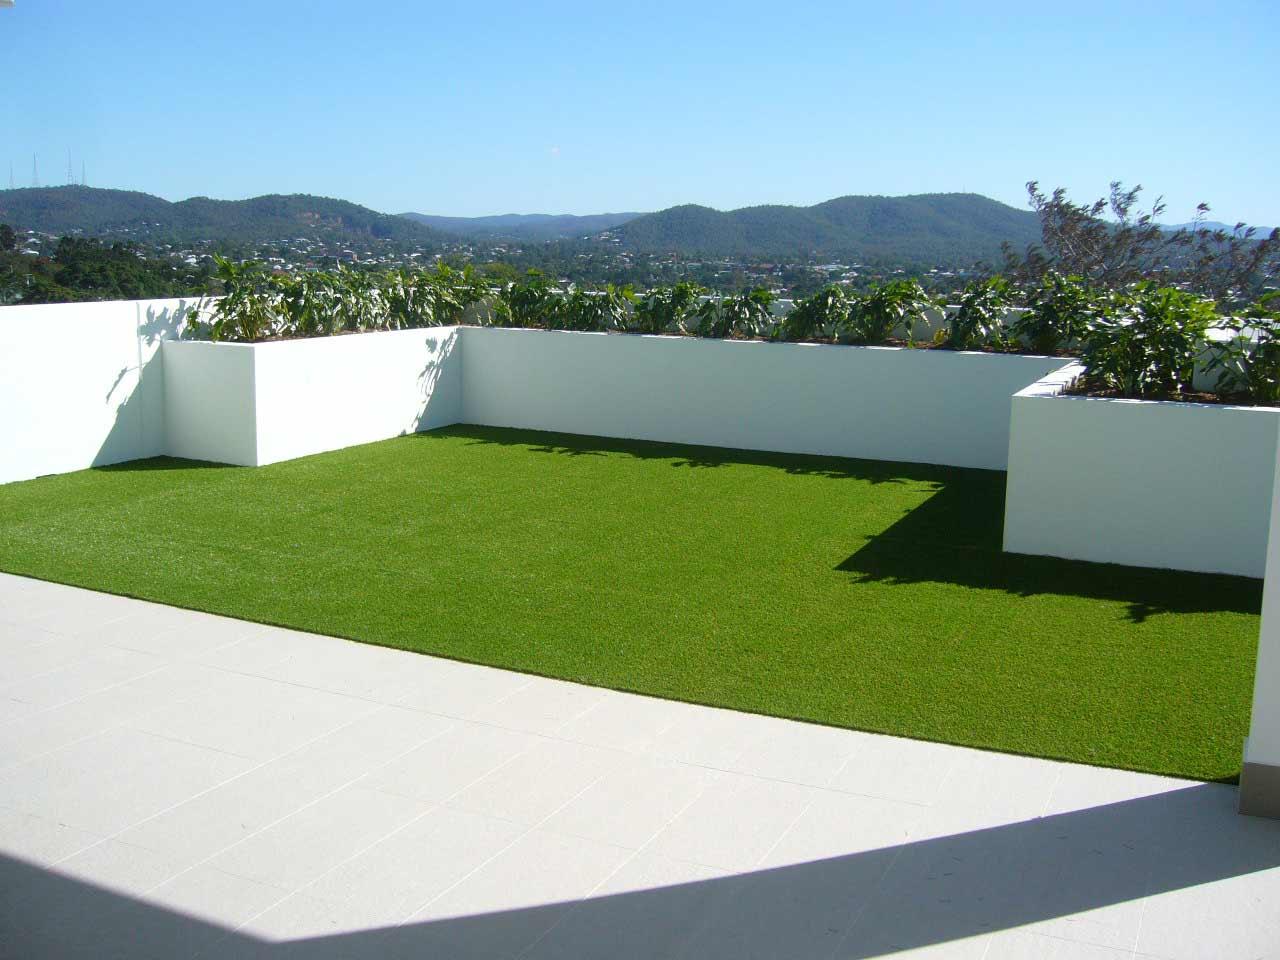 cesped artificial barato instalado en terraza